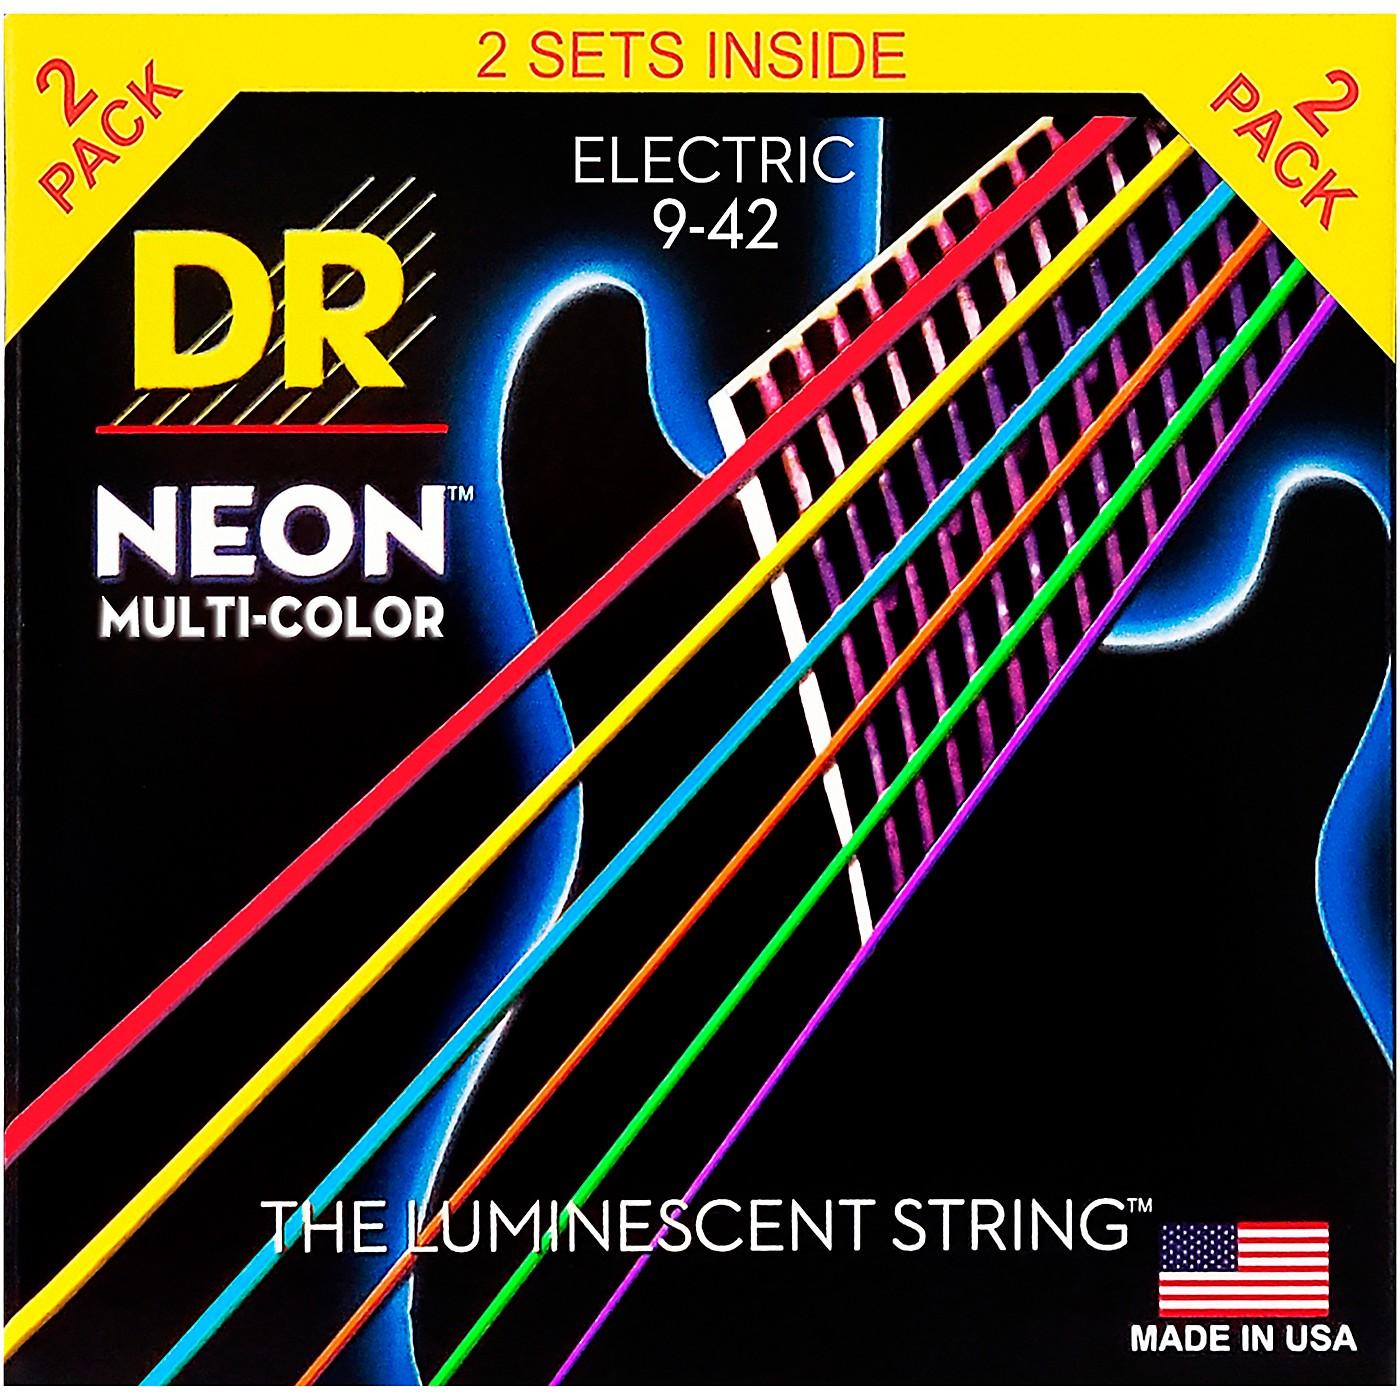 DR Strings Hi-Def NEON Multi-Color Light Electric Guitar Strings (9-42) 2 Pack thumbnail